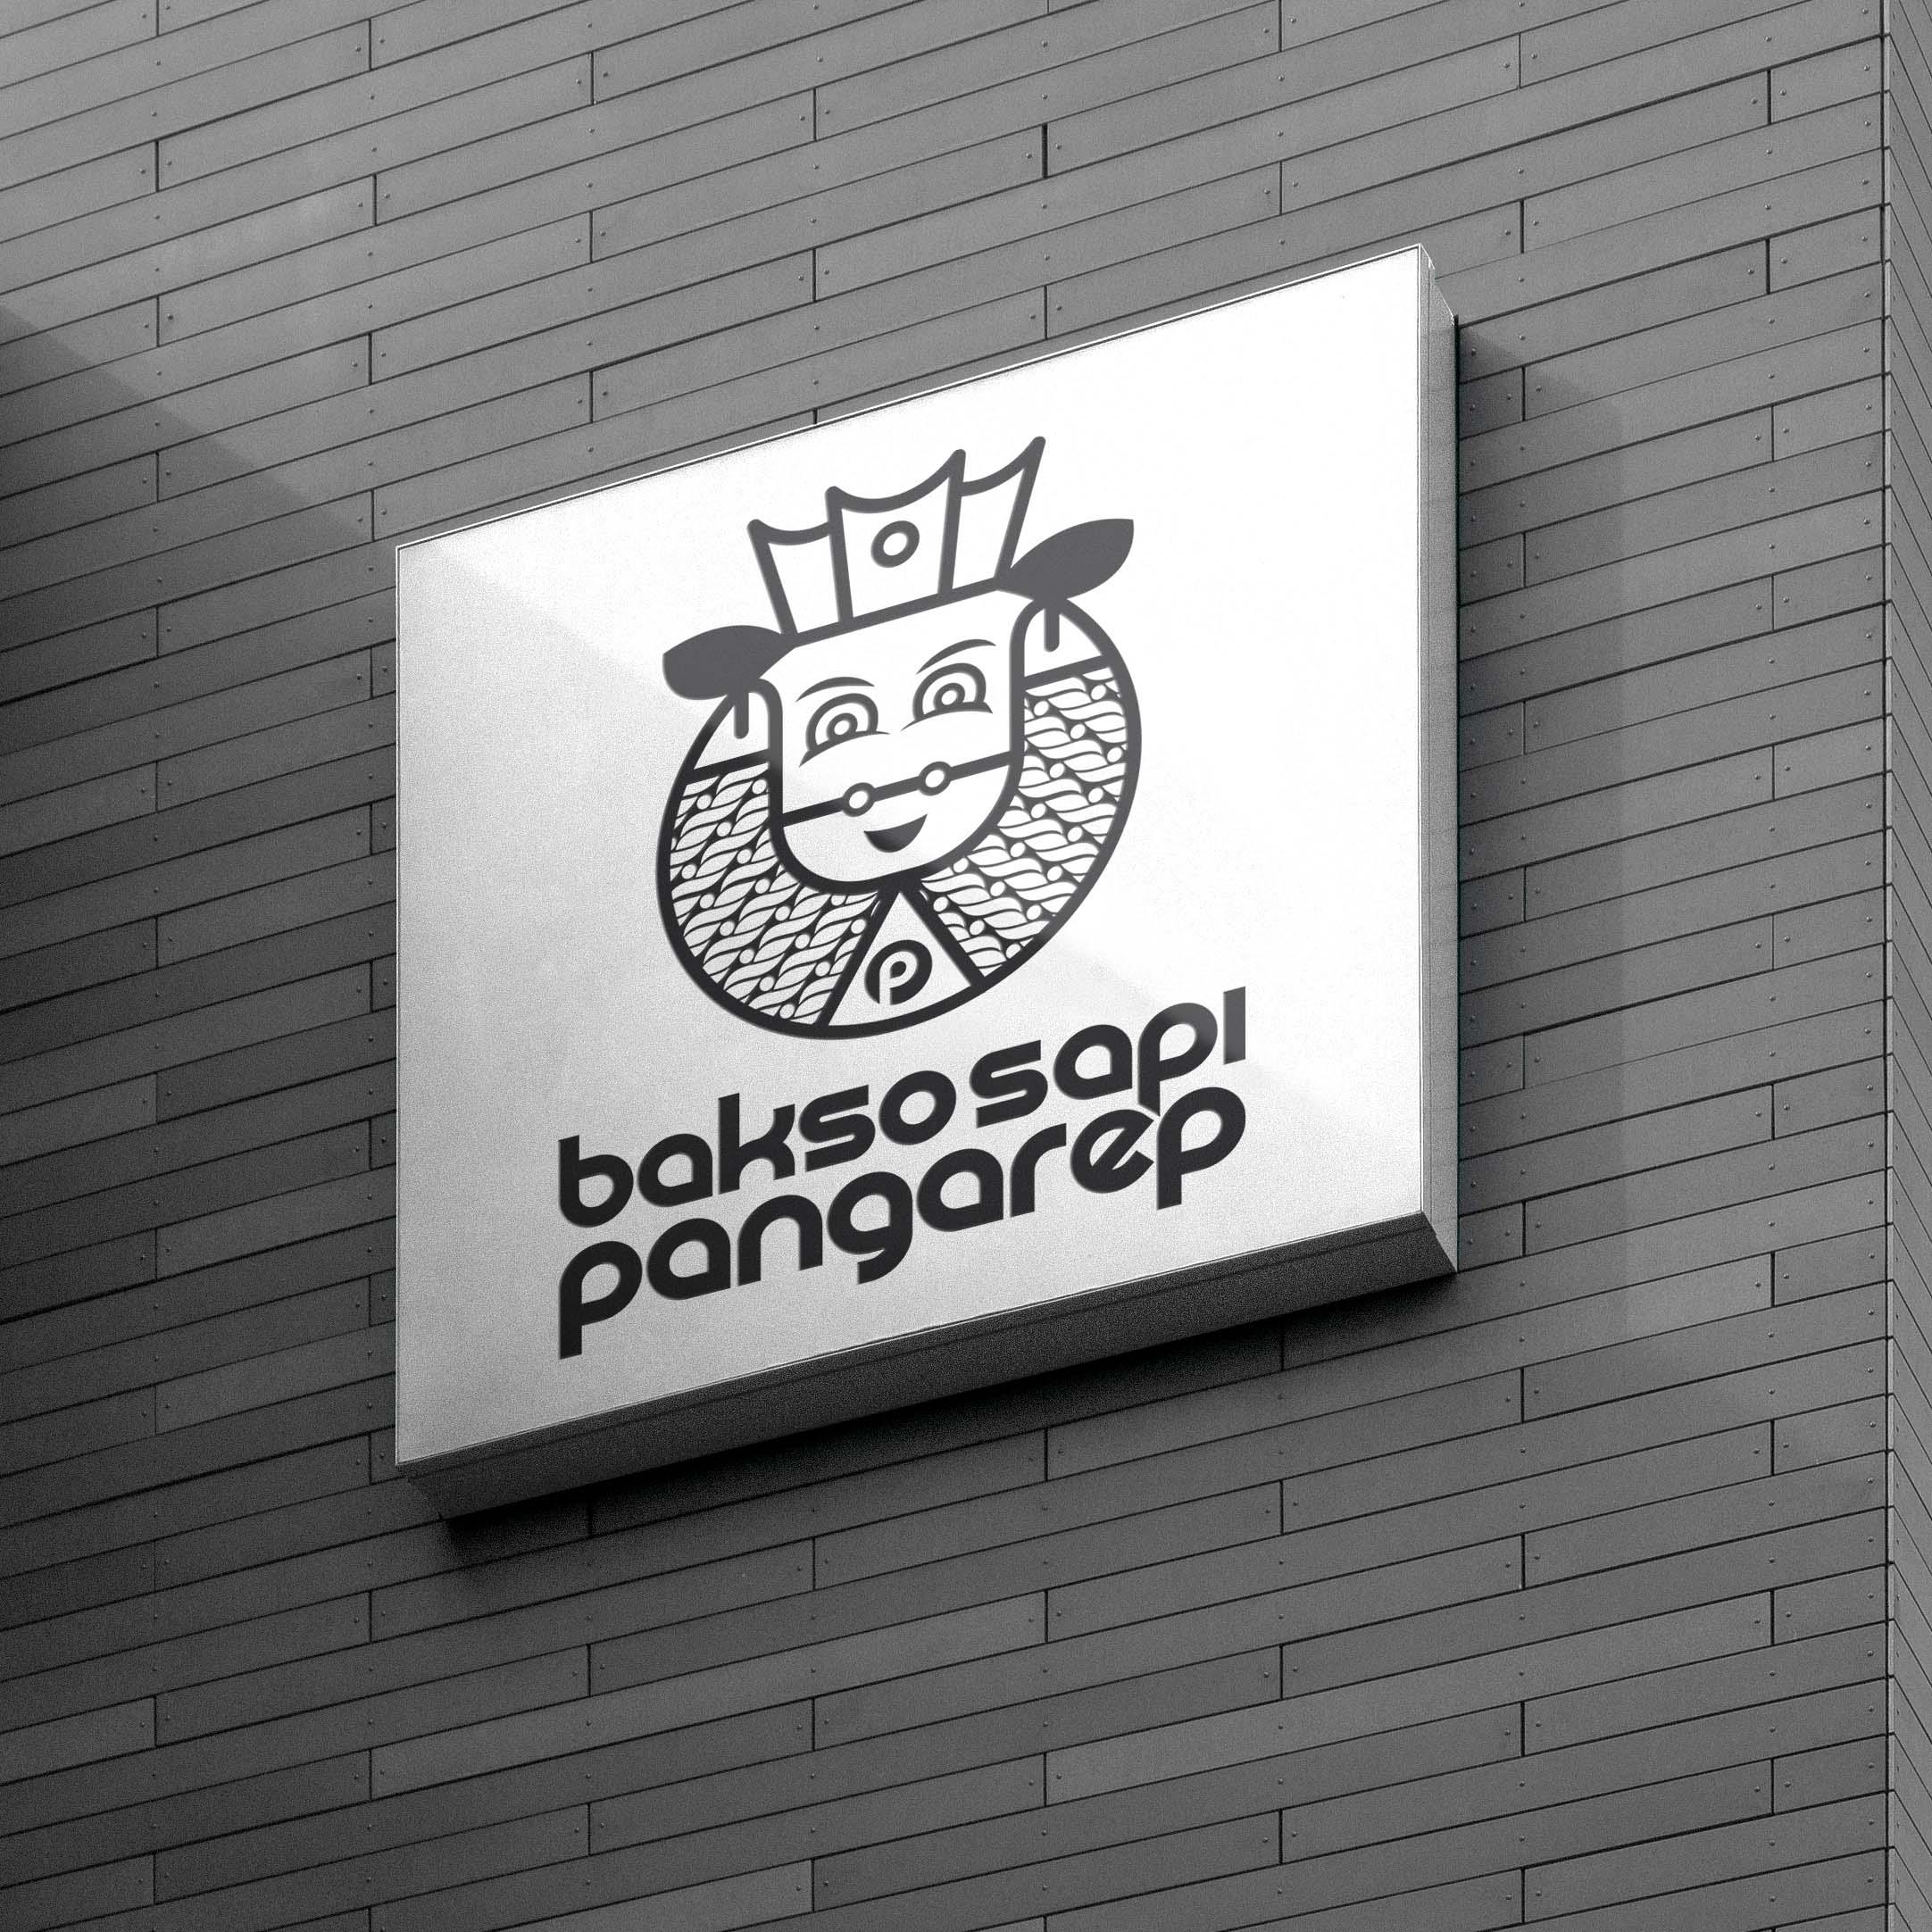 logo bakso sapi pangarep3black